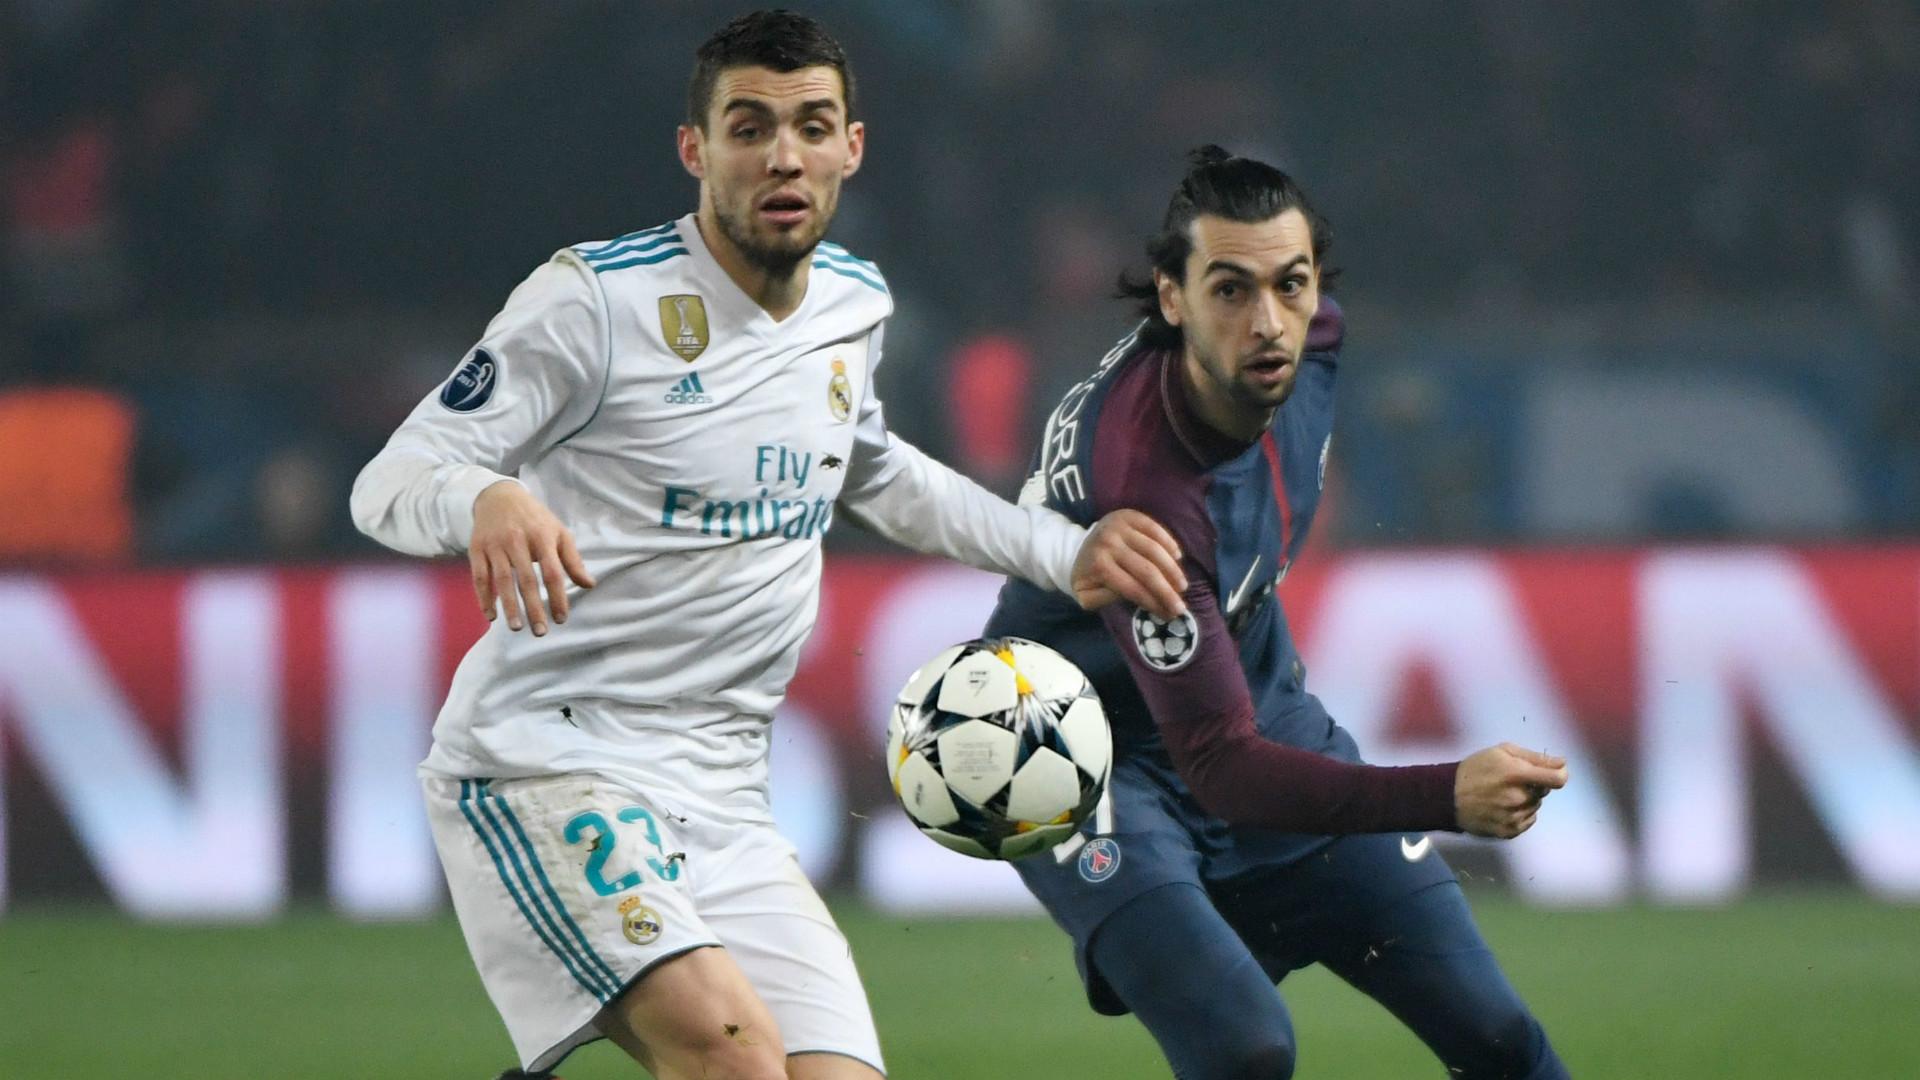 MATEO KOVACIC REAL MADRID JAVIER PASTORE PARIS SAINT-GERMAIN UEFA CHAMPIONS LEAGUE 06032018